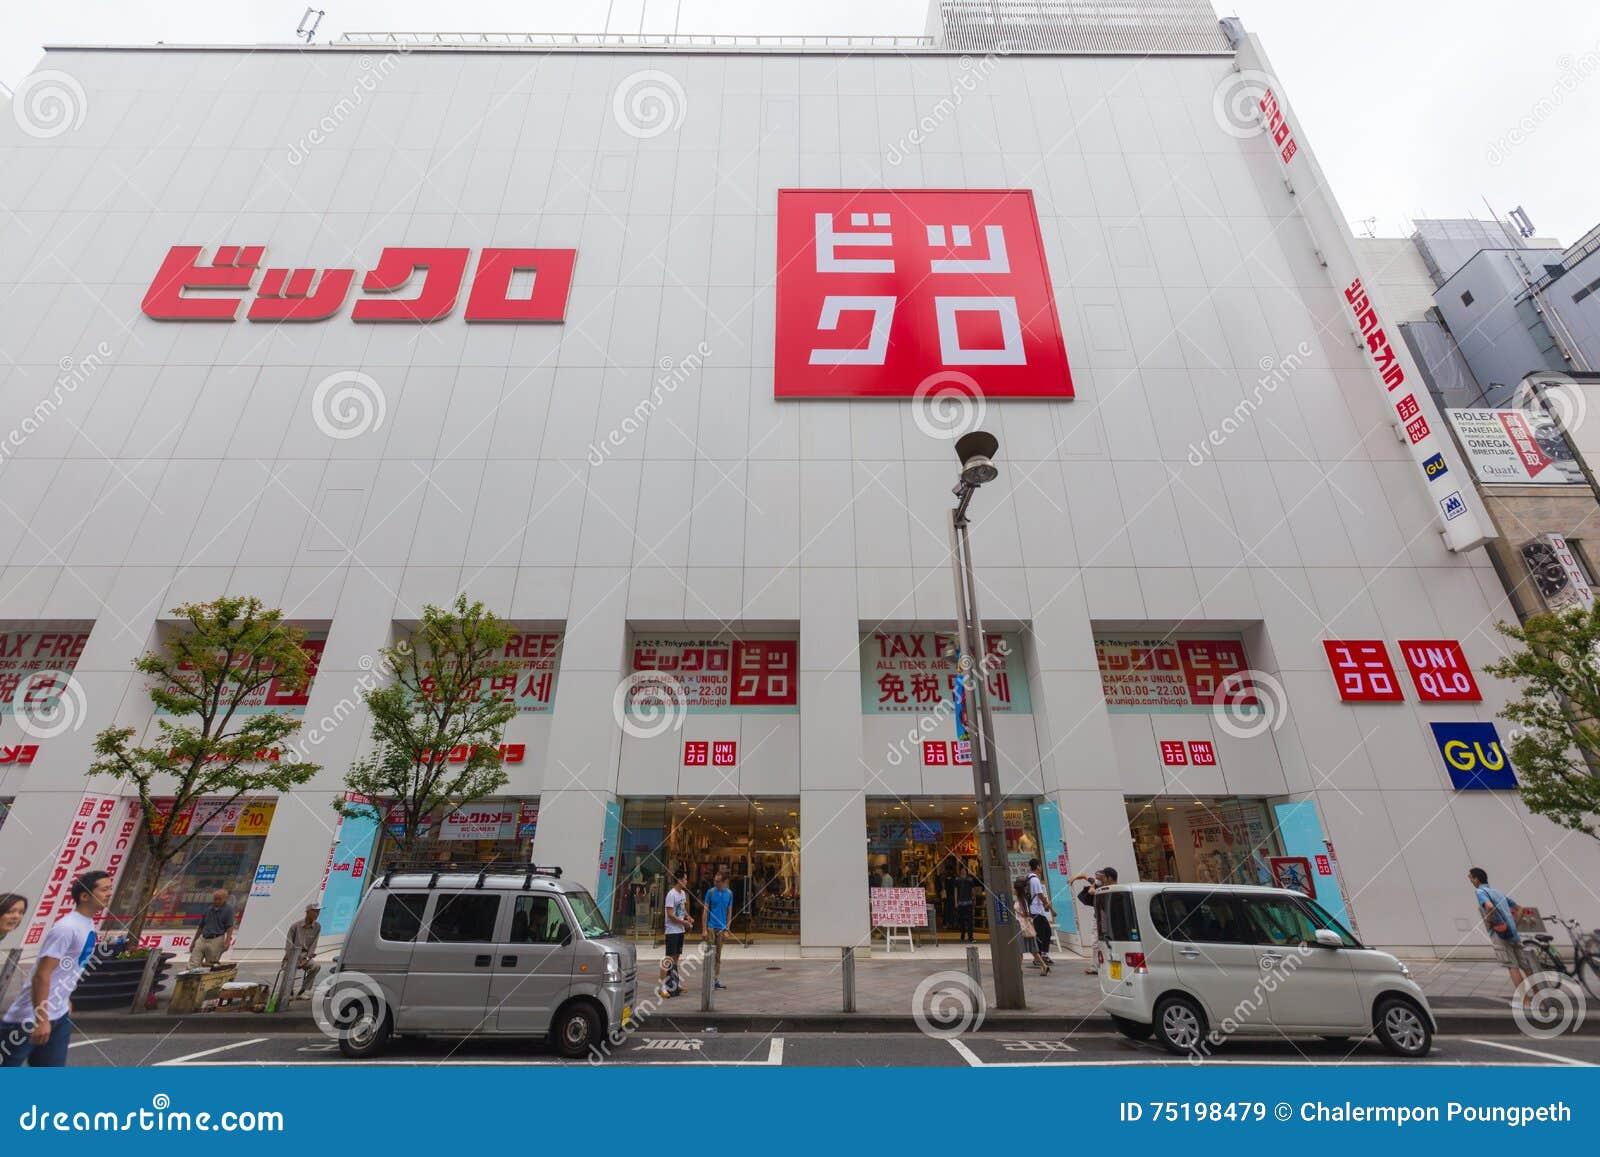 uniqlo store in shinjuku japan